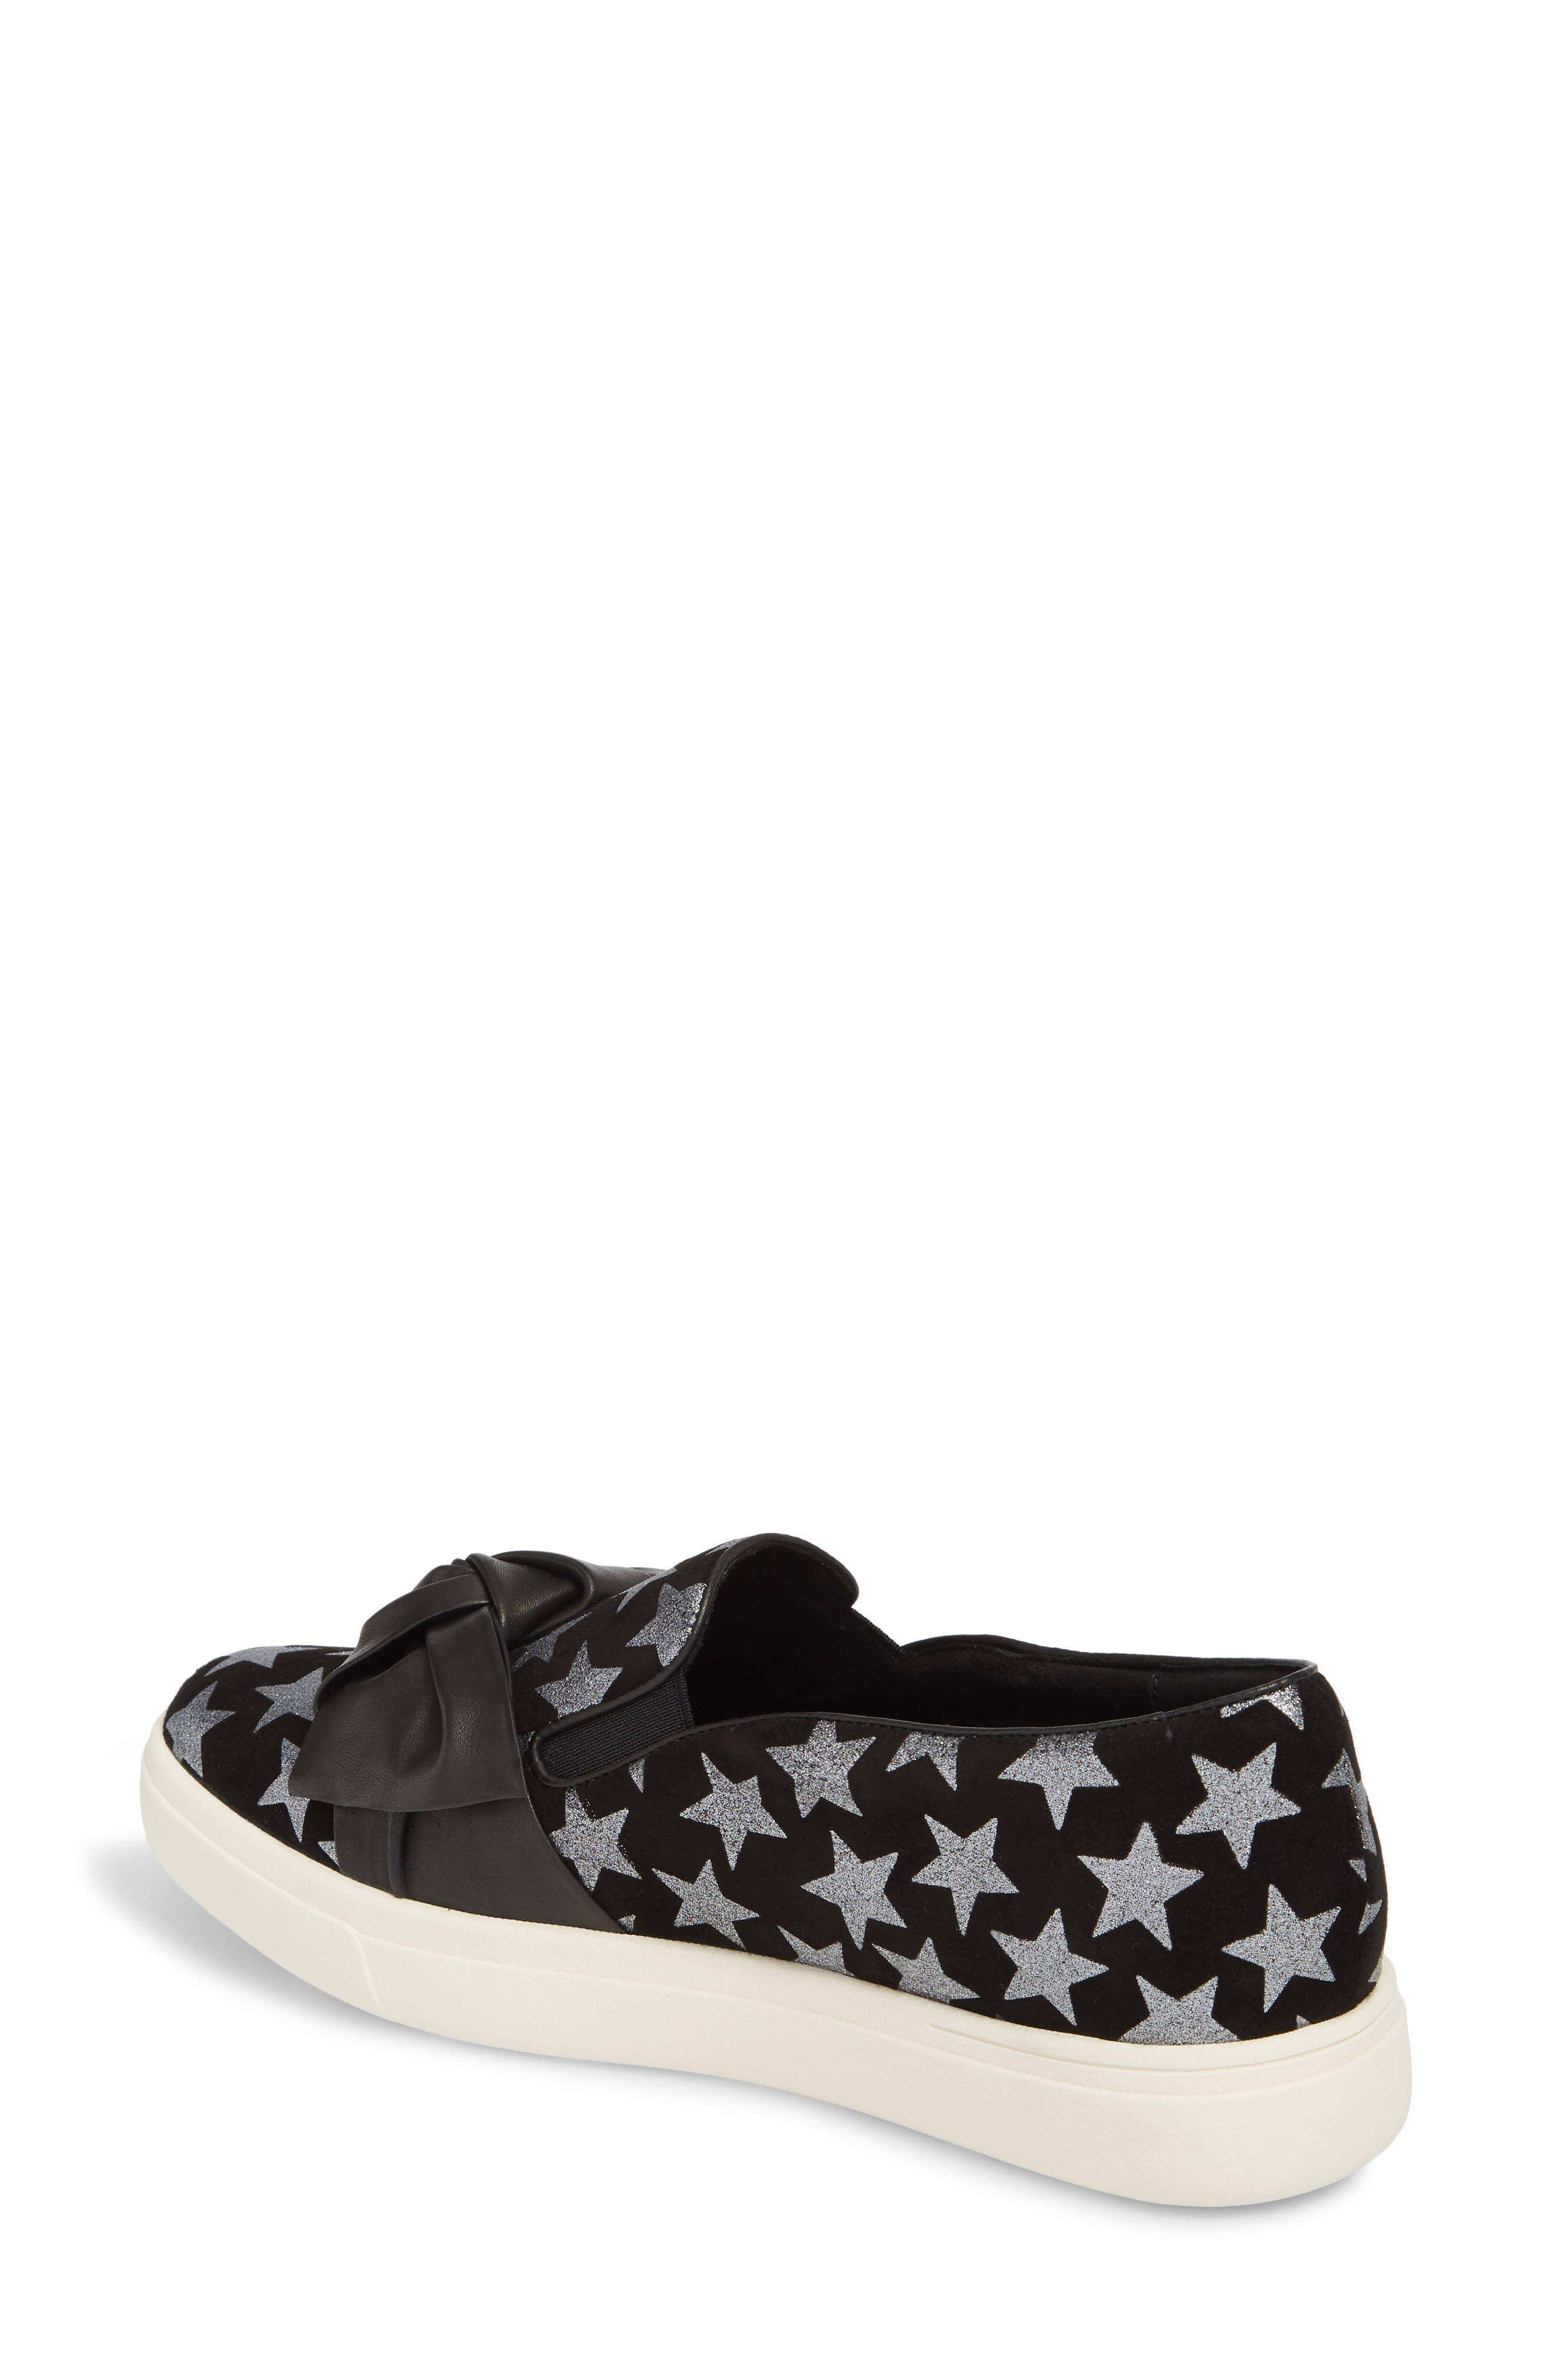 VANELI,                             Odelet Slip-On Sneaker,                             Alternate thumbnail 2, color,                             BLACK/ PEWTER SUEDE